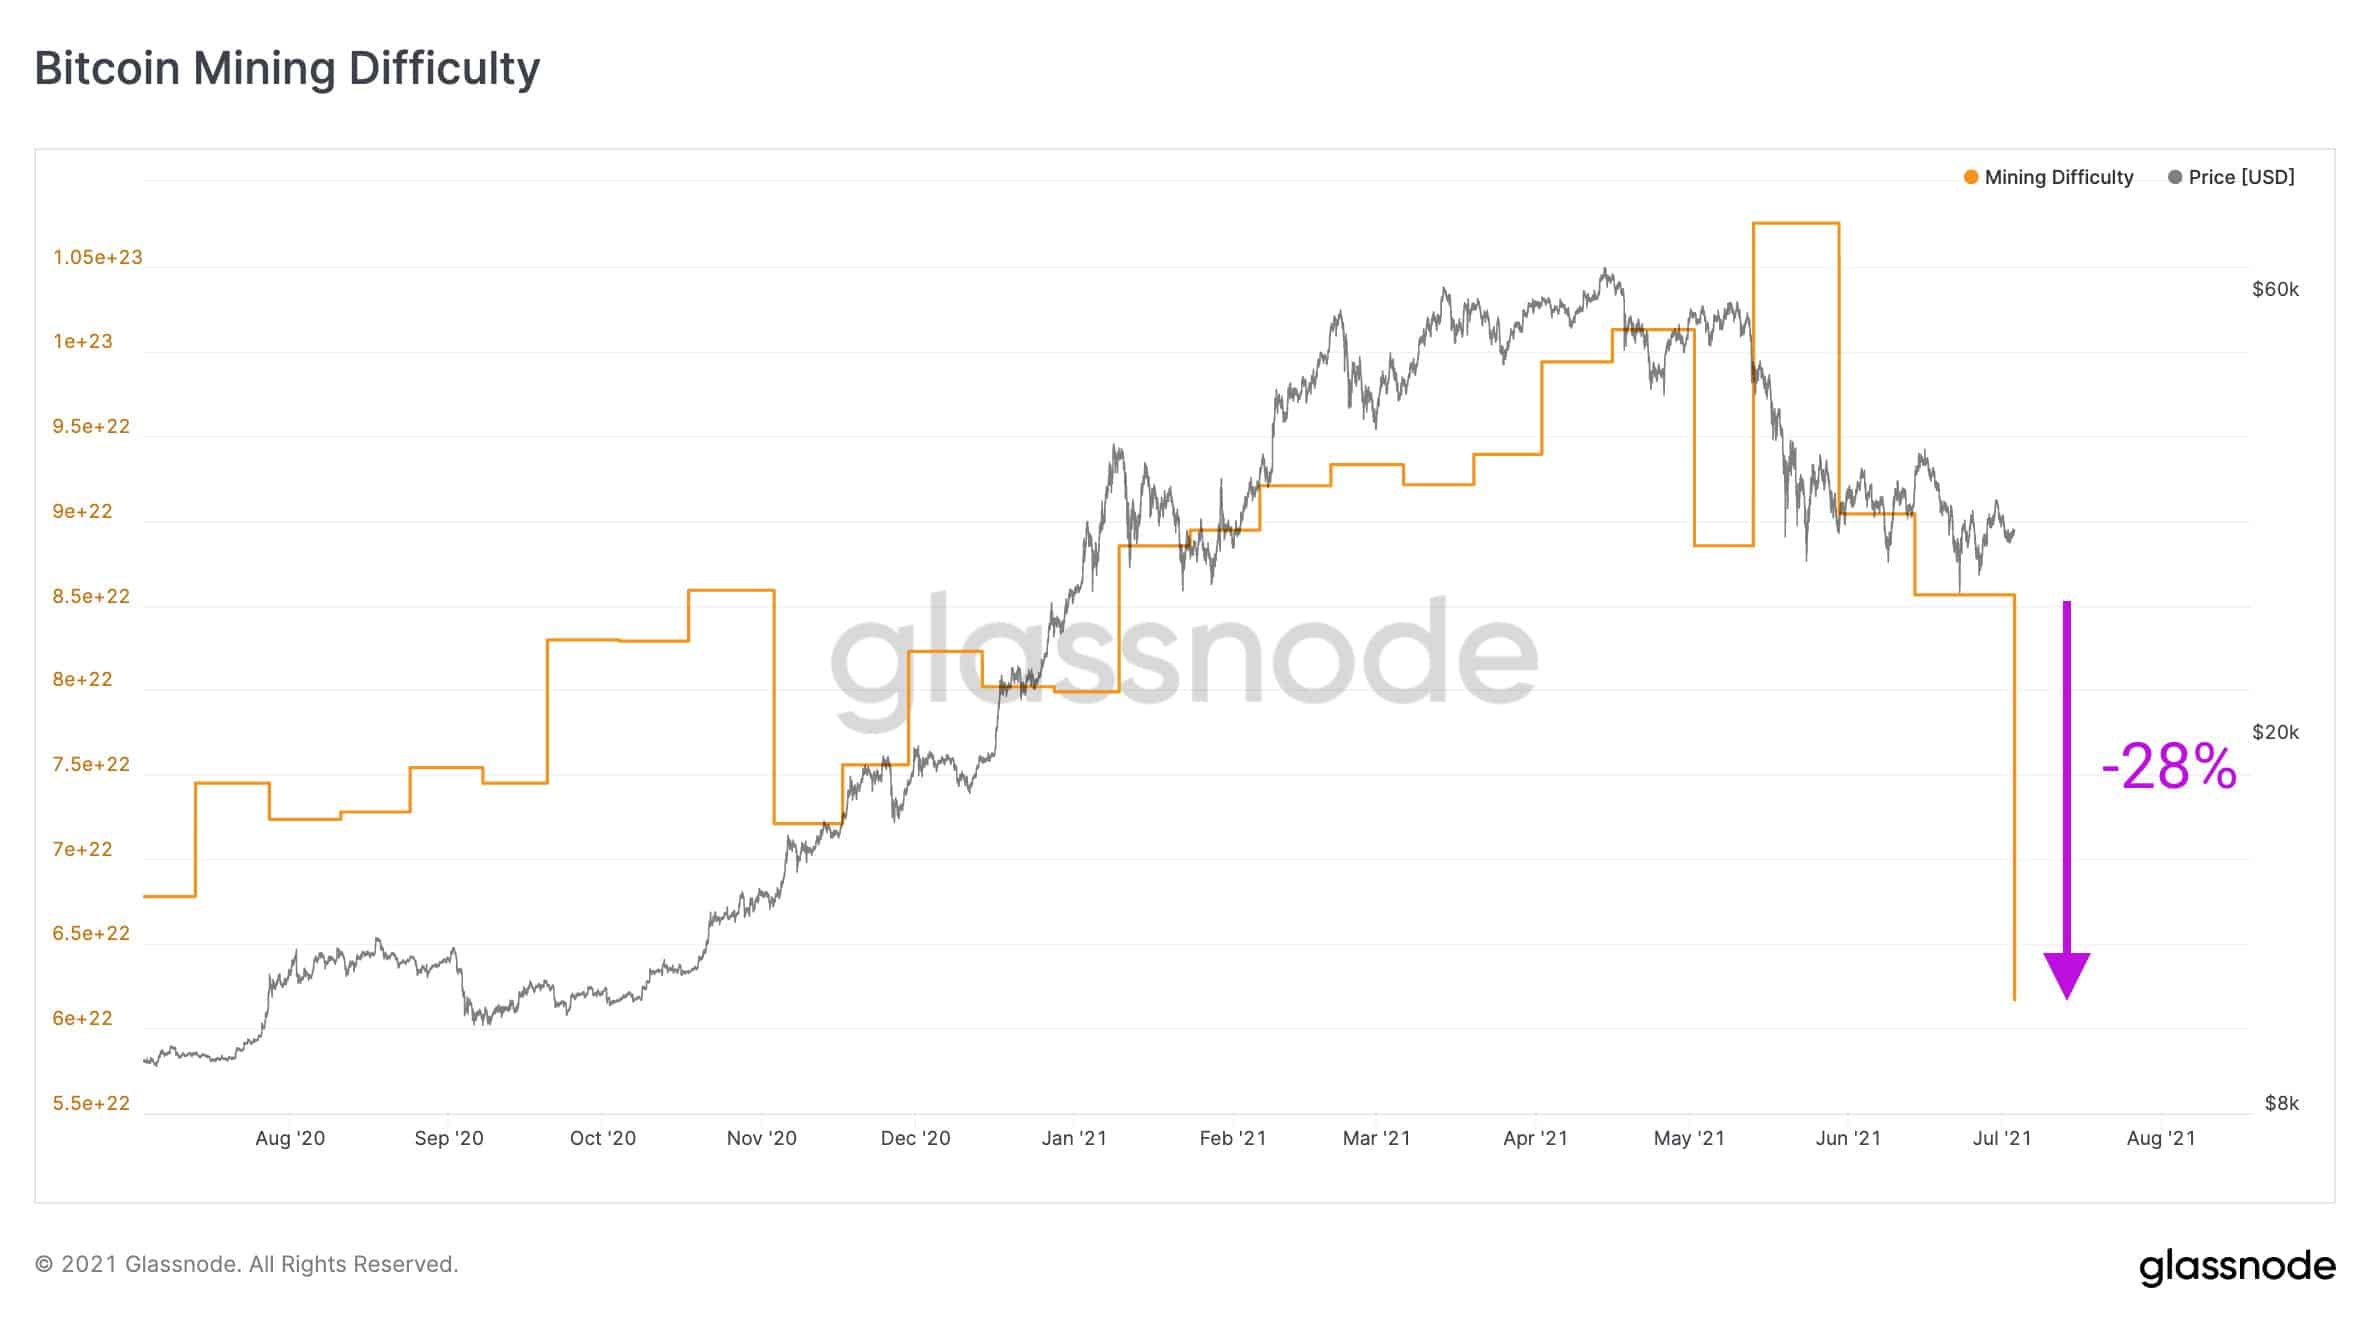 pregled botova za trgovanje kriptovalutama kako ostvariti profit rudarstvom bitcoina